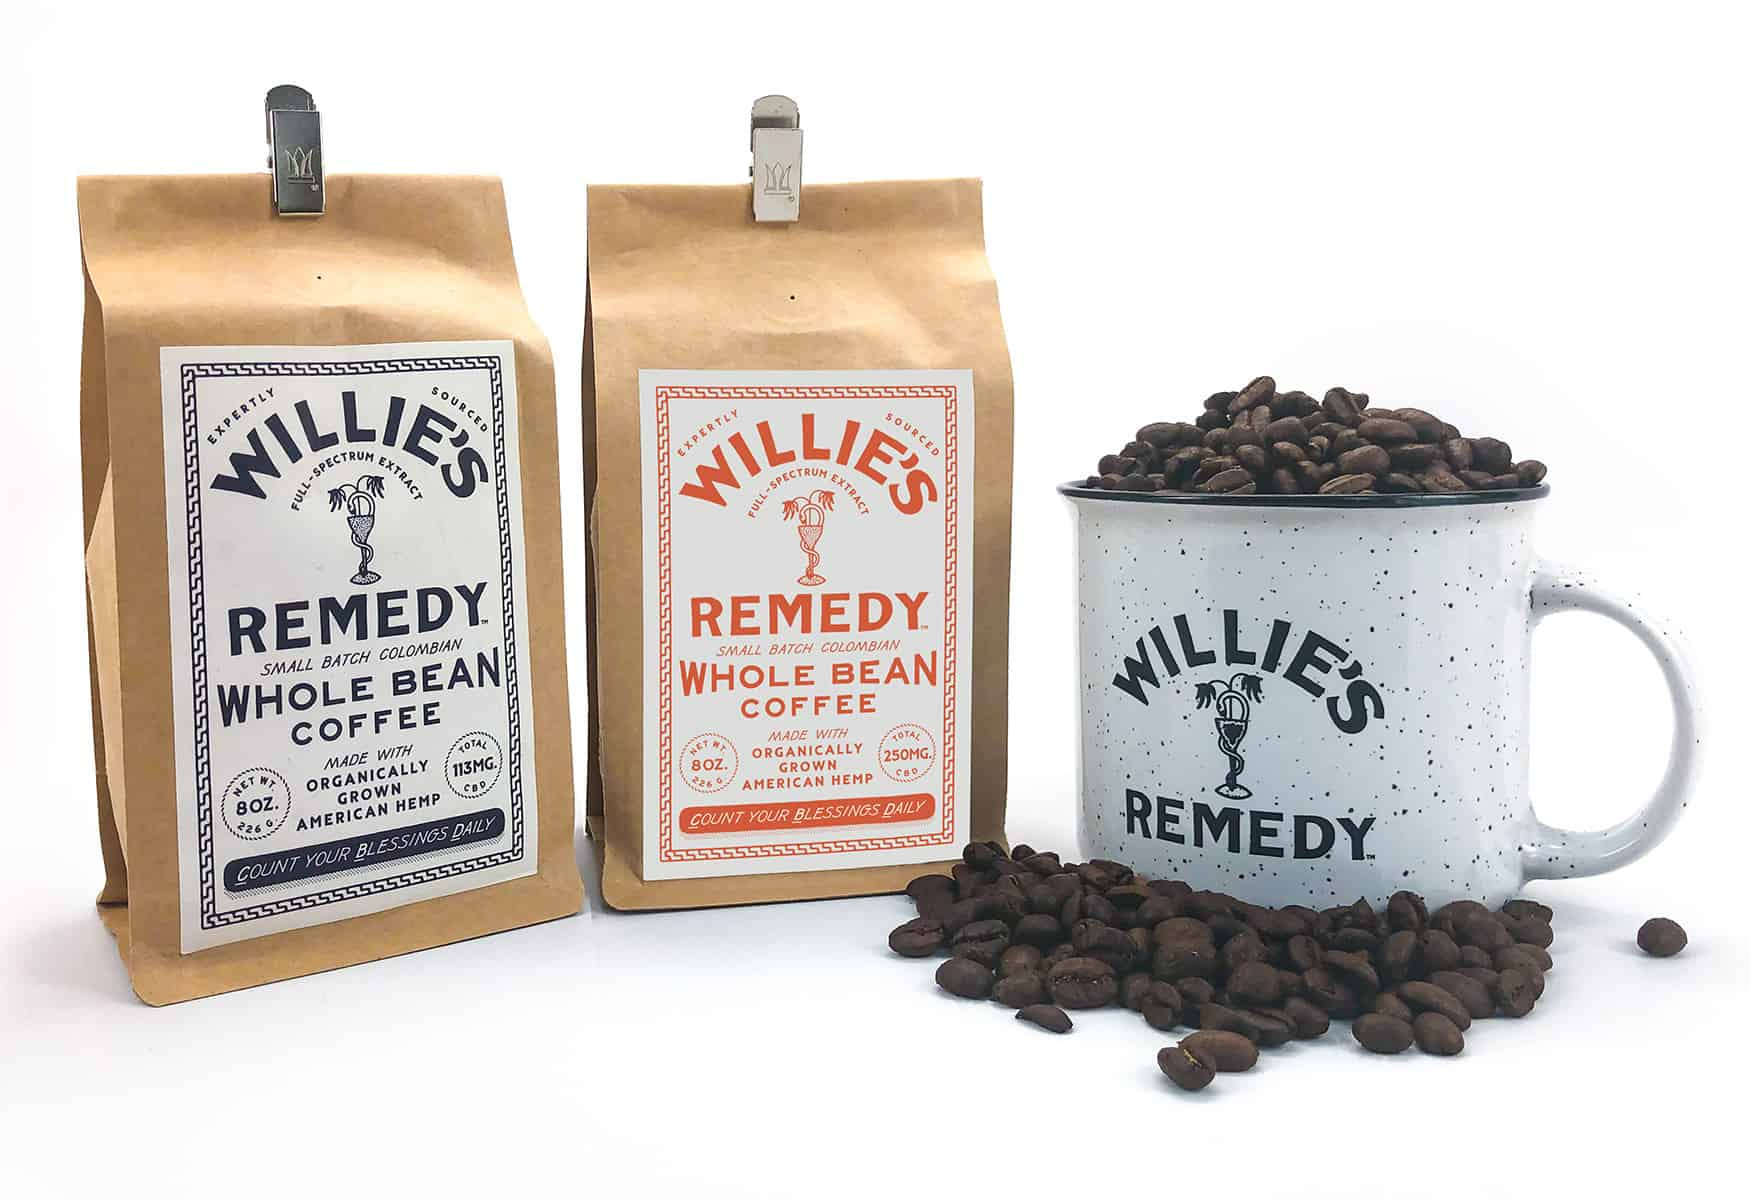 Willie's Remedy coffee